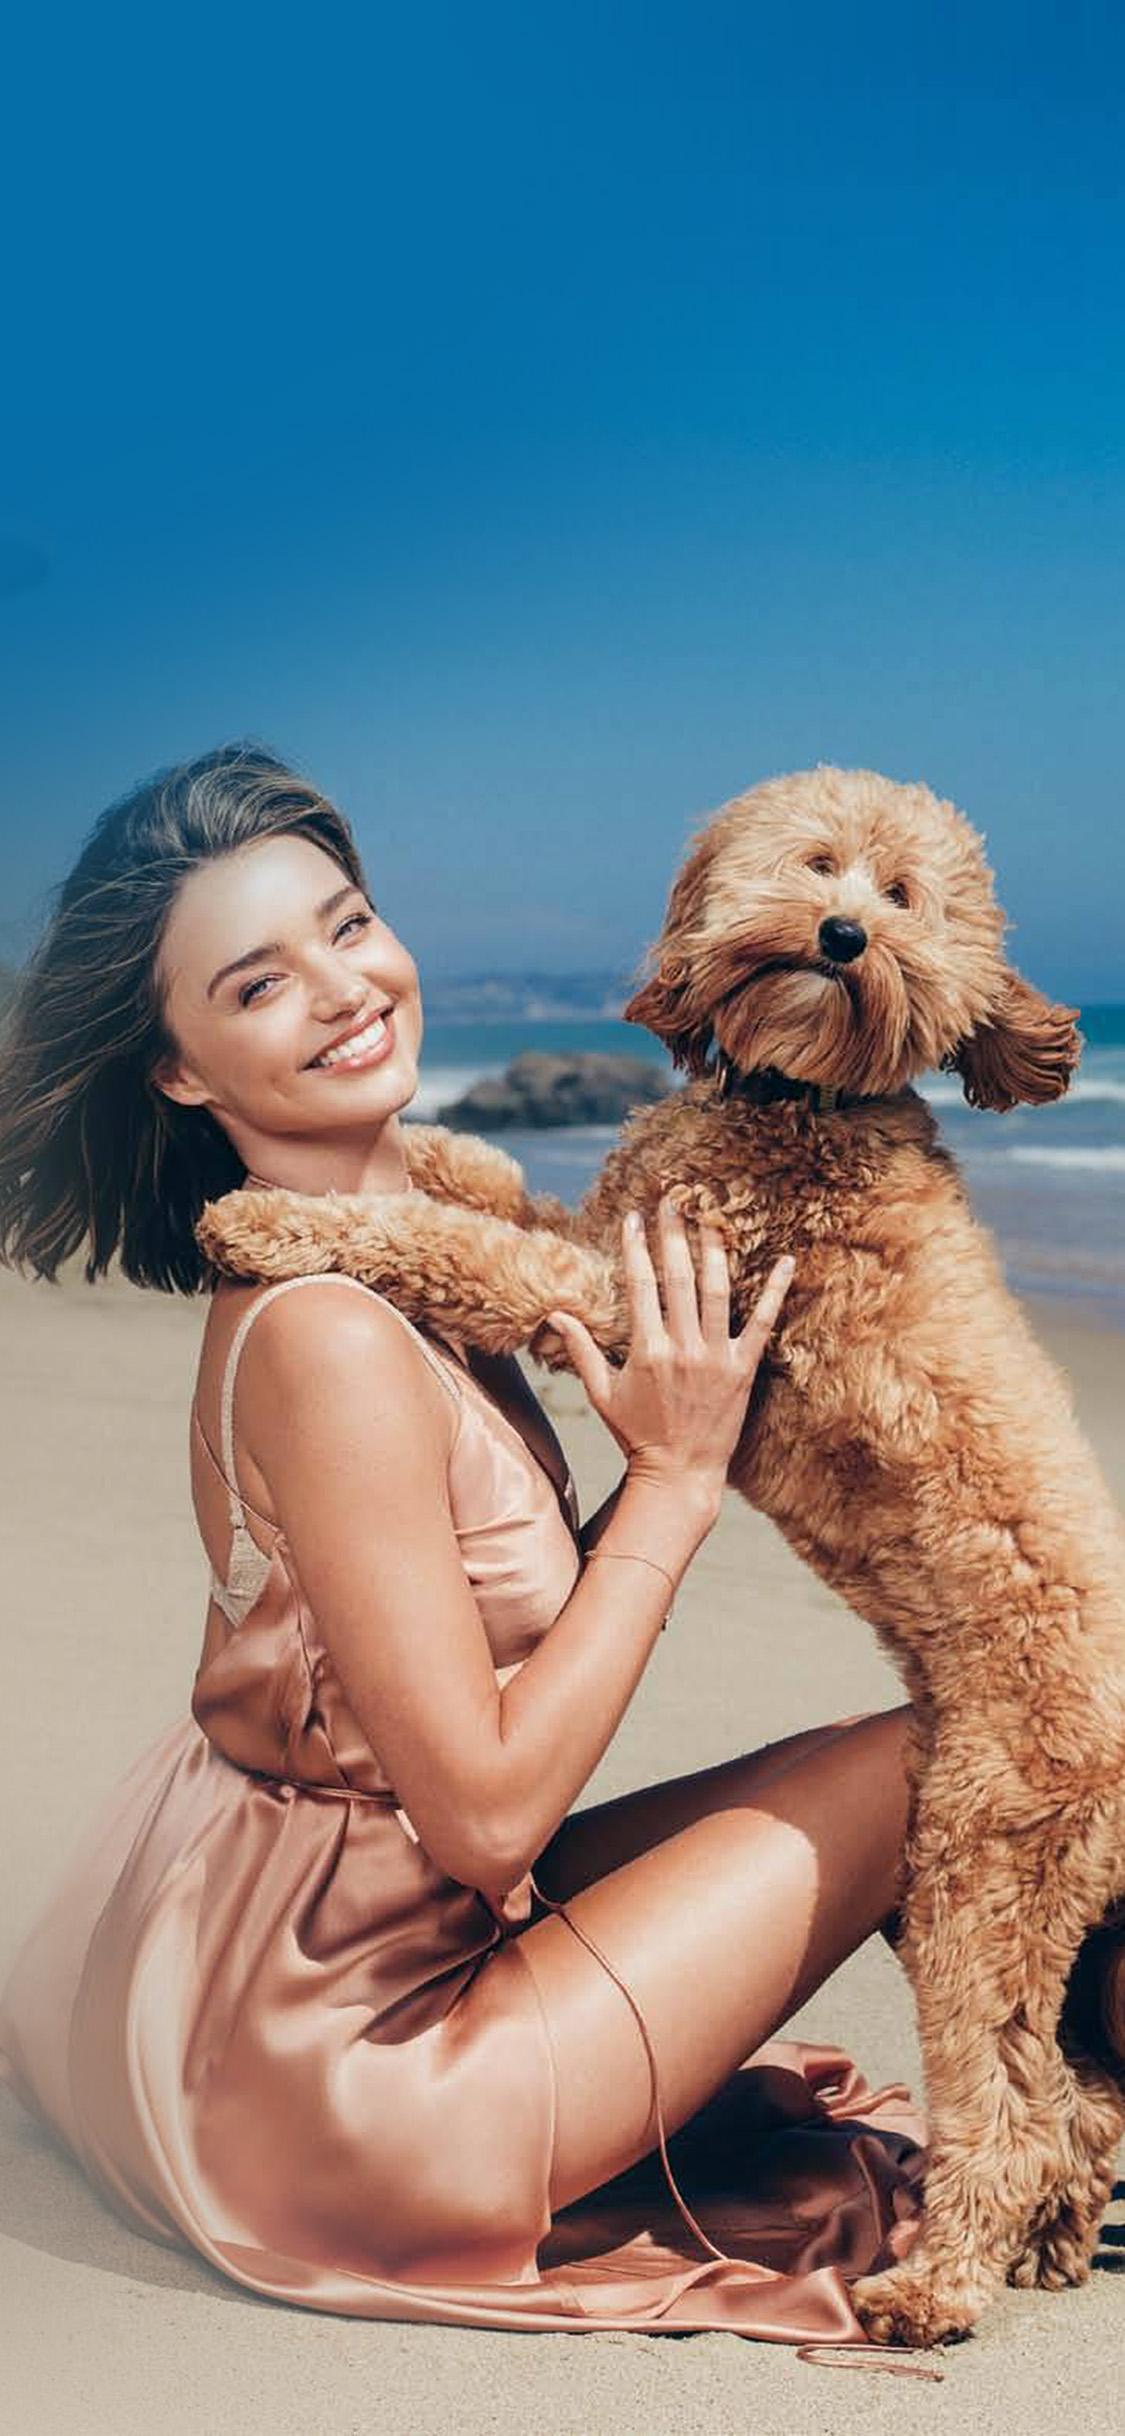 iPhonexpapers.com-Apple-iPhone-wallpaper-hr11-miranda-kerr-dog-beach-summer-model-girl